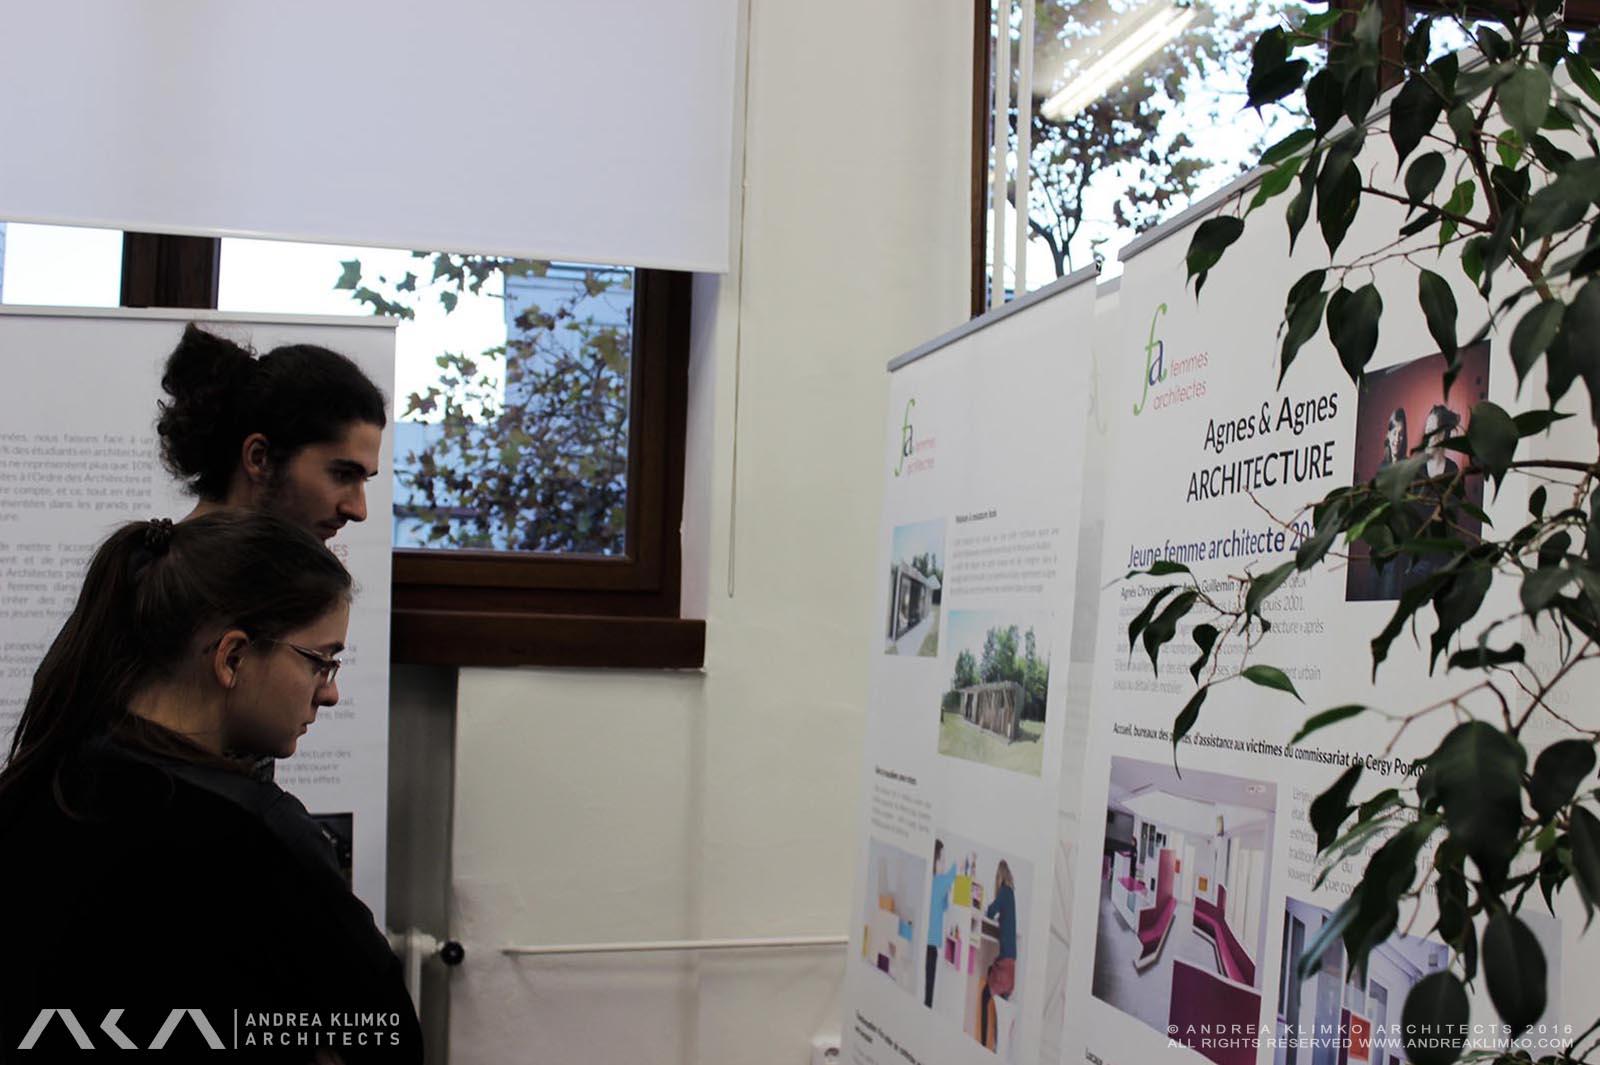 prix-des-femmes-architectes-on-display-in-bratislava_11